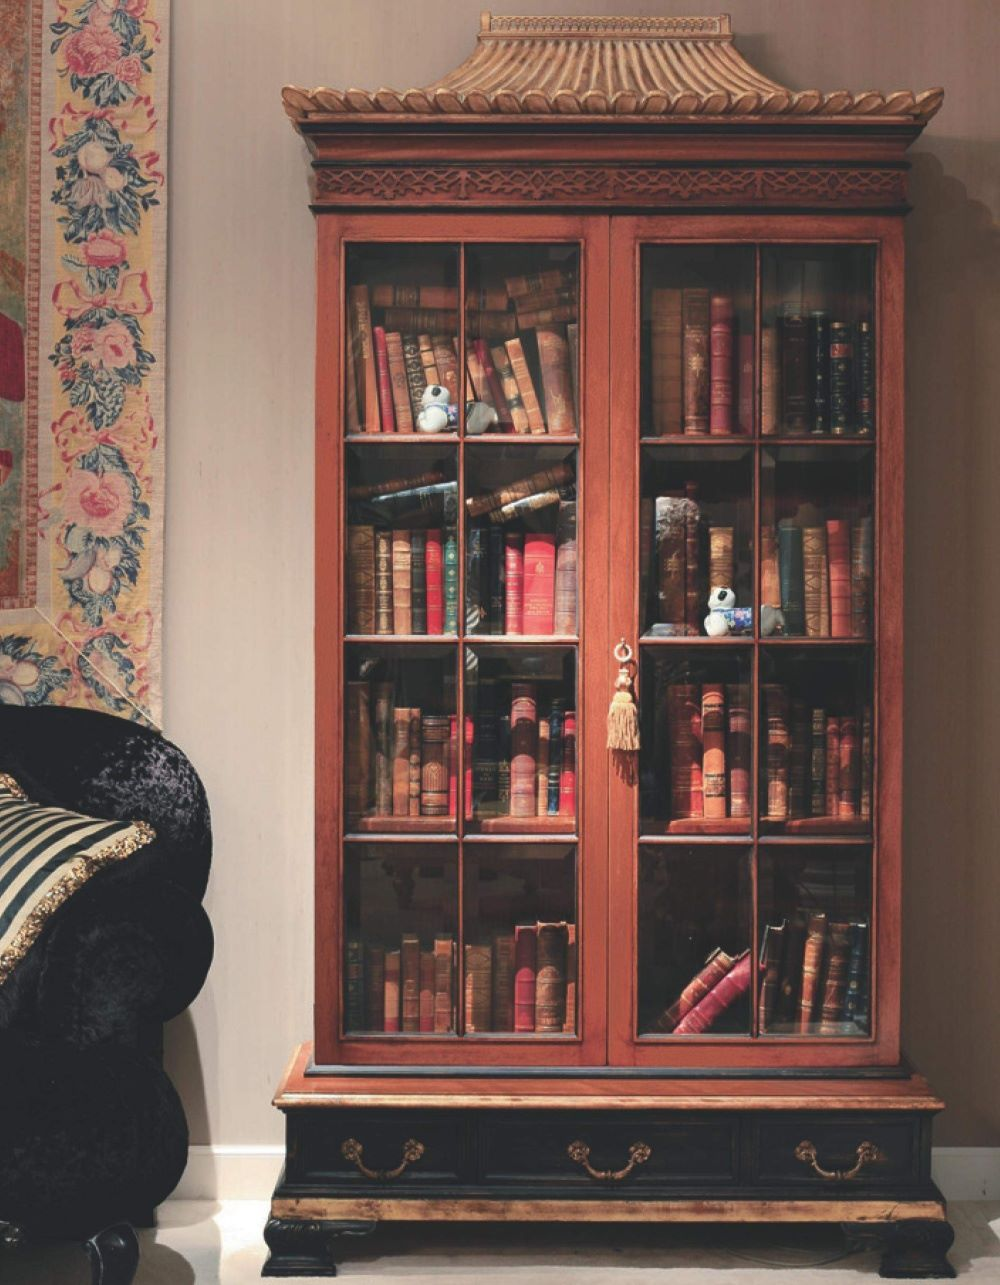 Книжный шкаф 2701, фабрика provasi. книжный шкаф 2701 на зак.